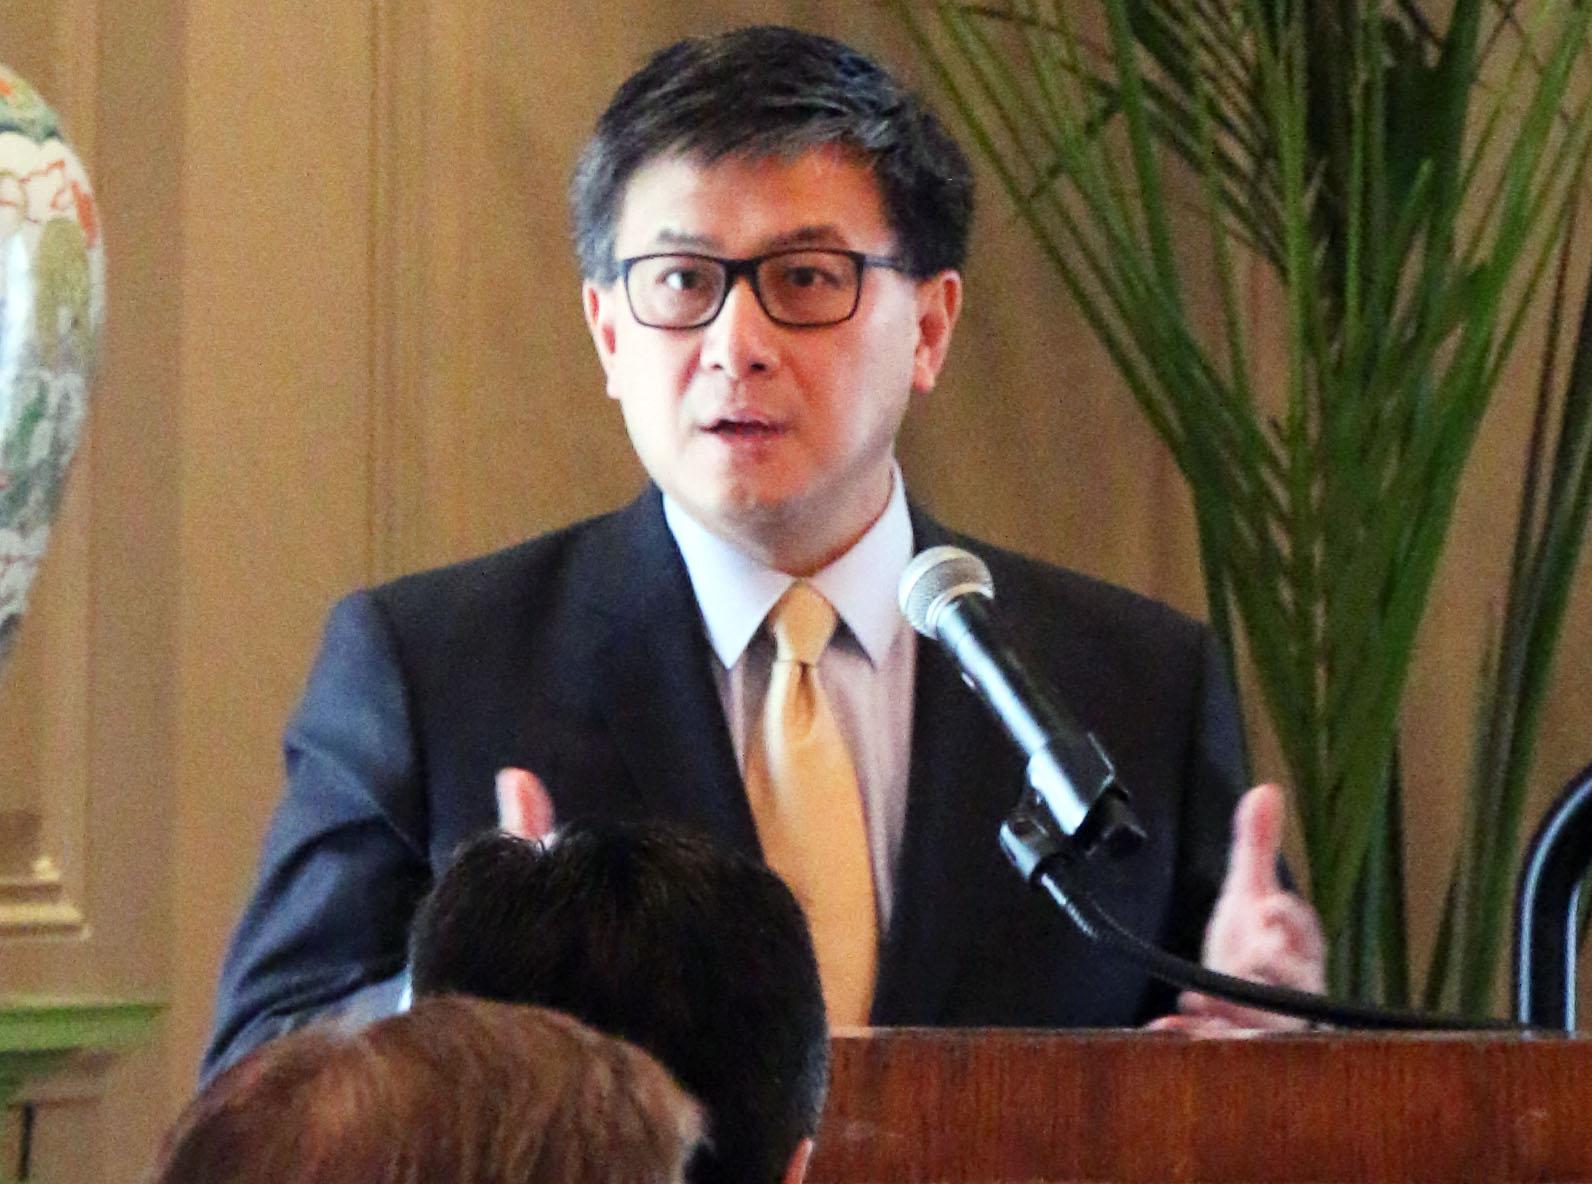 Treasurer Chiang Presents New CBIG Website at LAEDC Board Meeting